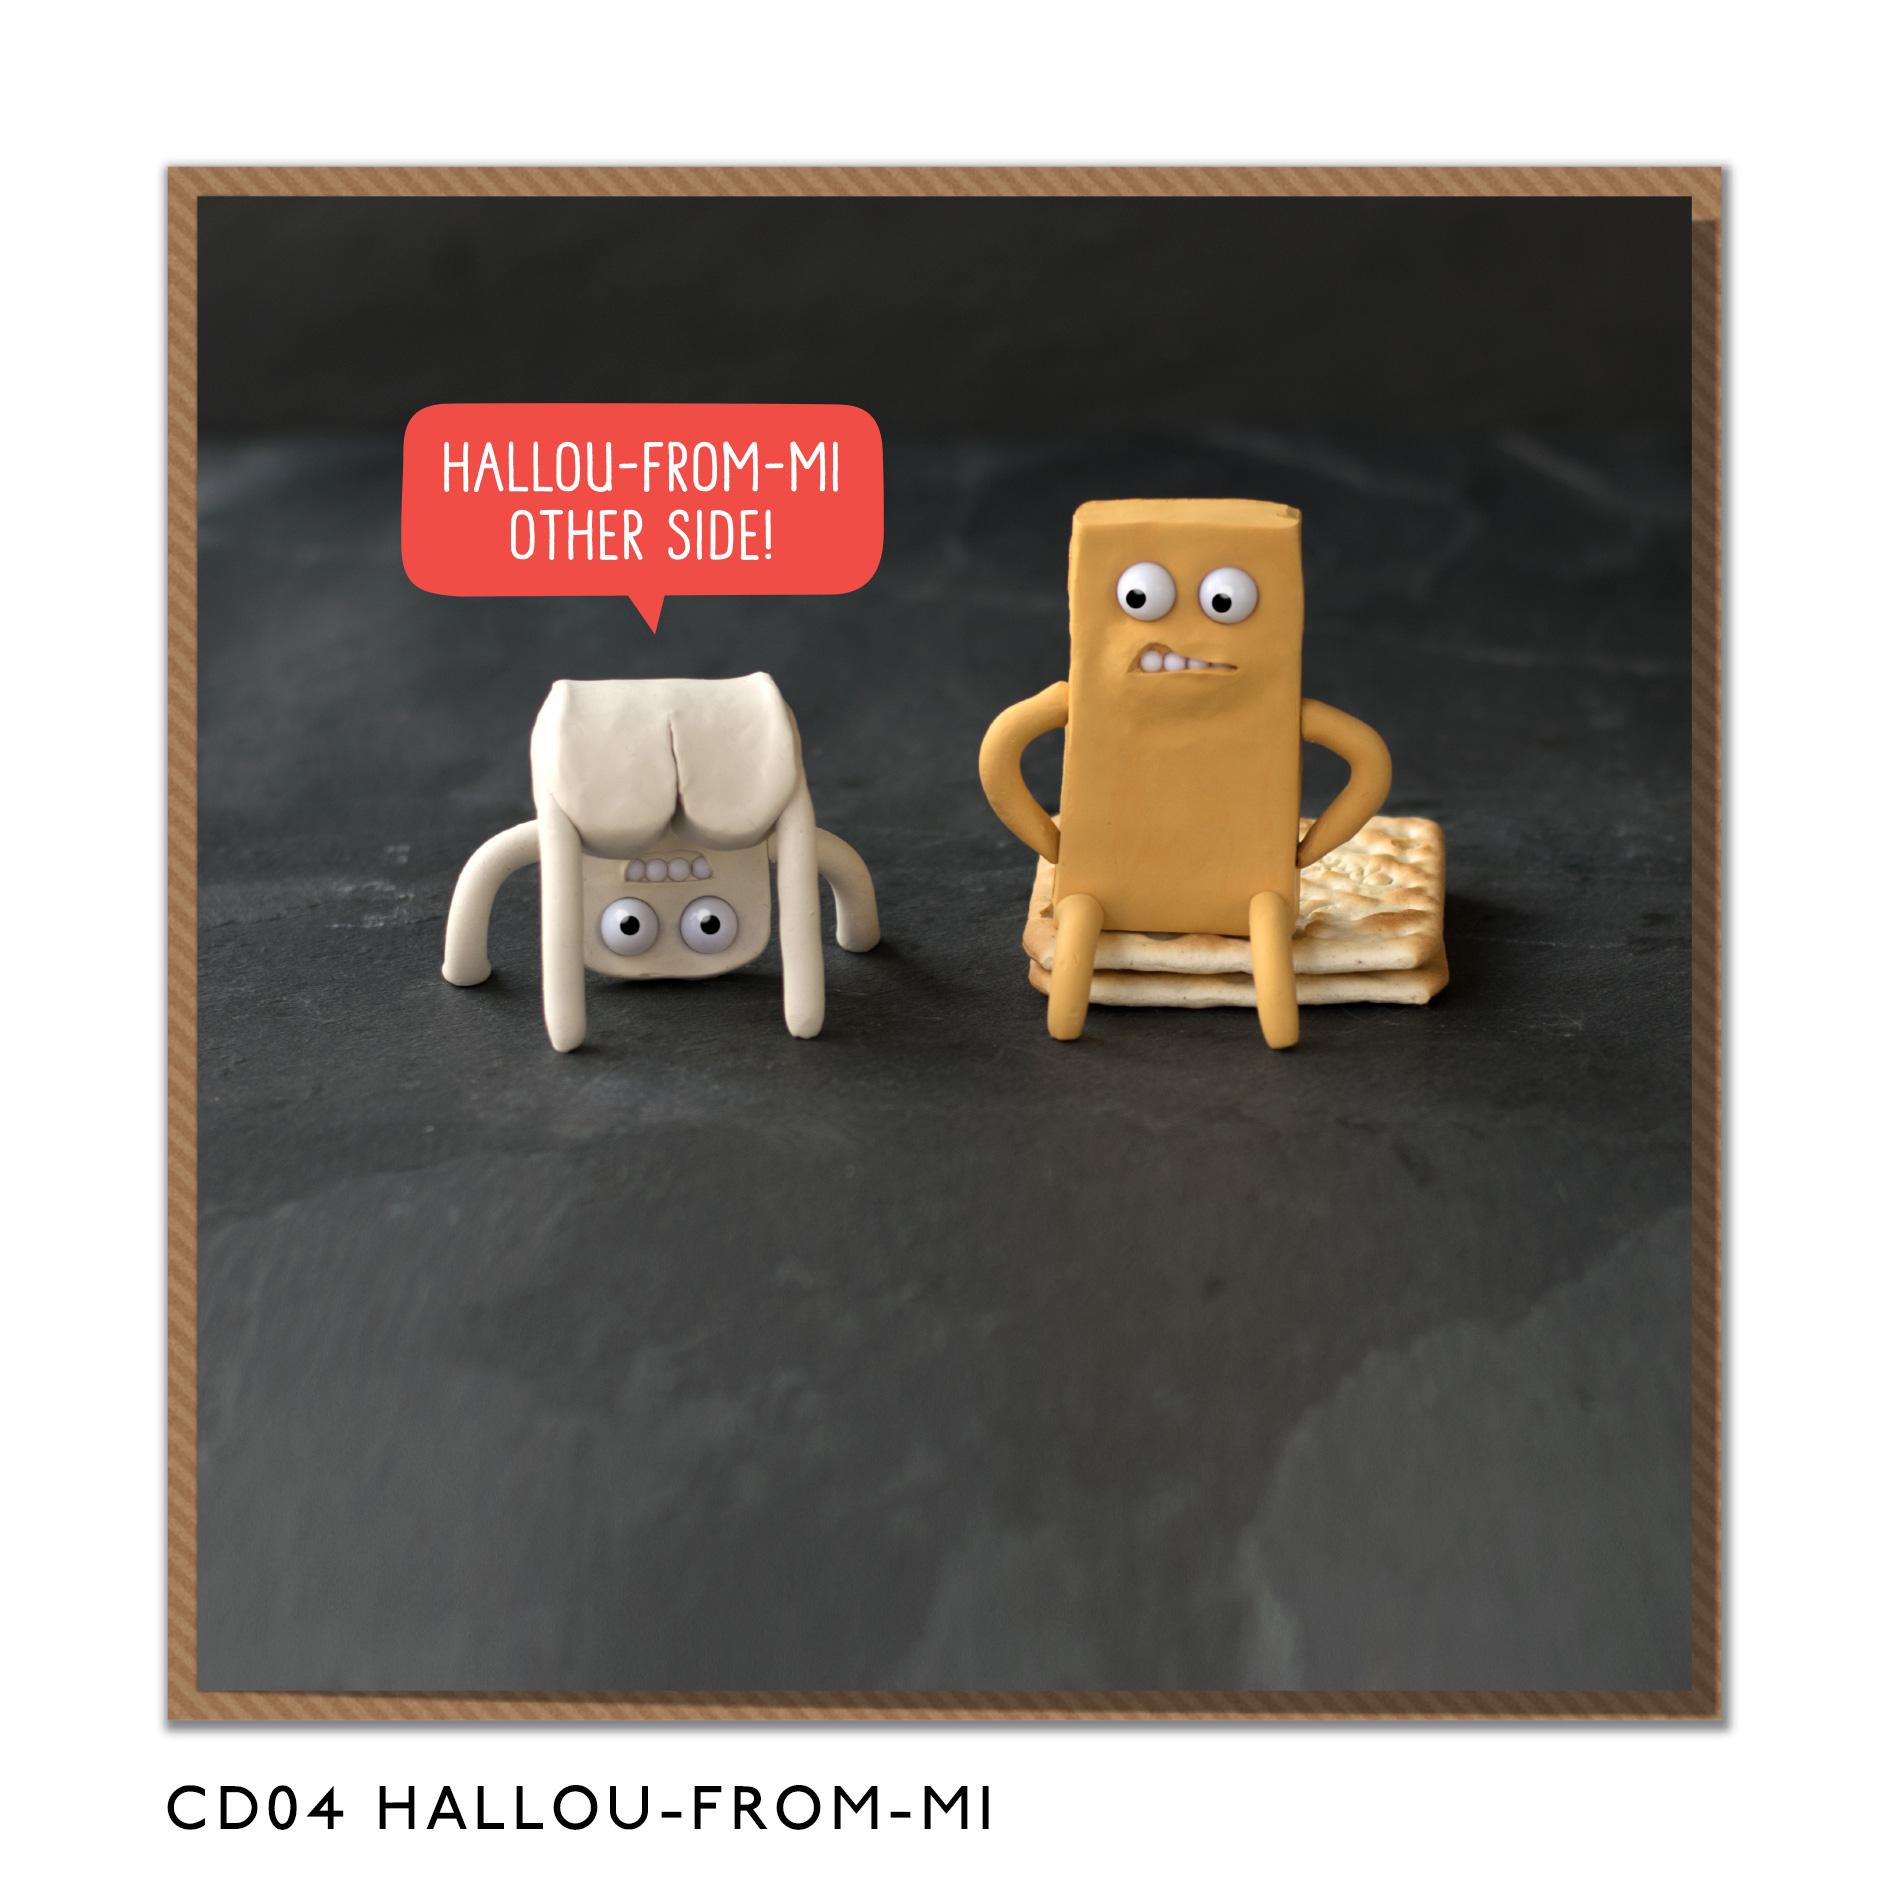 CD04-HALLOU-FROM-MI.jpg